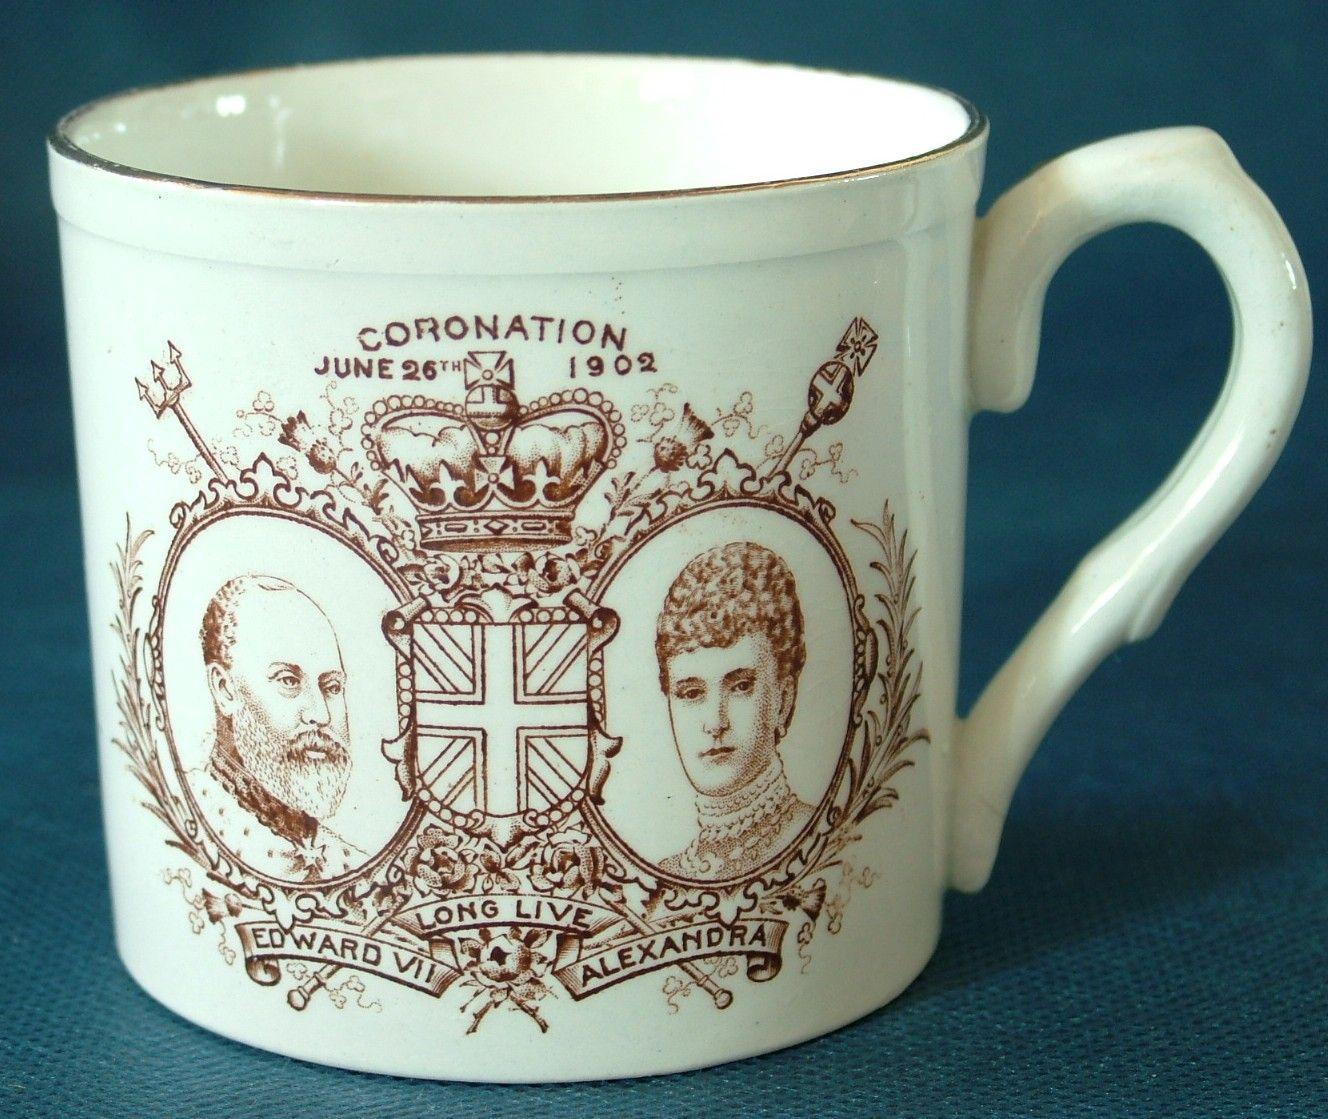 Foley China Coronation Of Edward Vii And Queen Alexandra 1902 Commemorative Ceramic Mug Legacy Antiques And Collectibles Ltd Commemoration Ceramic Mug Coronation